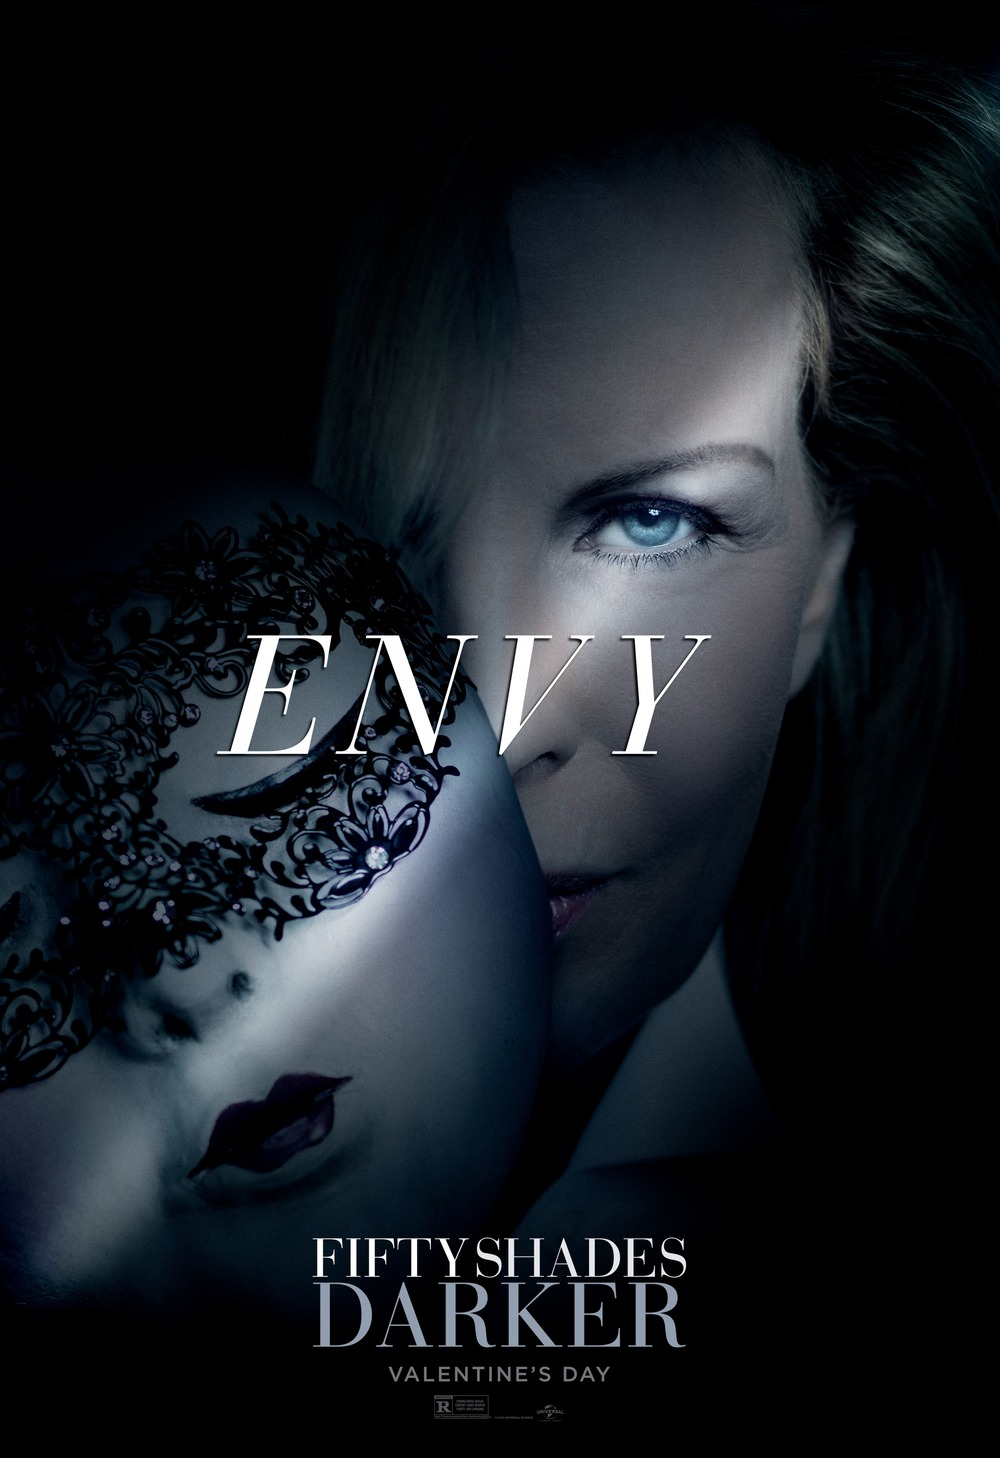 Fifty shades darker release date